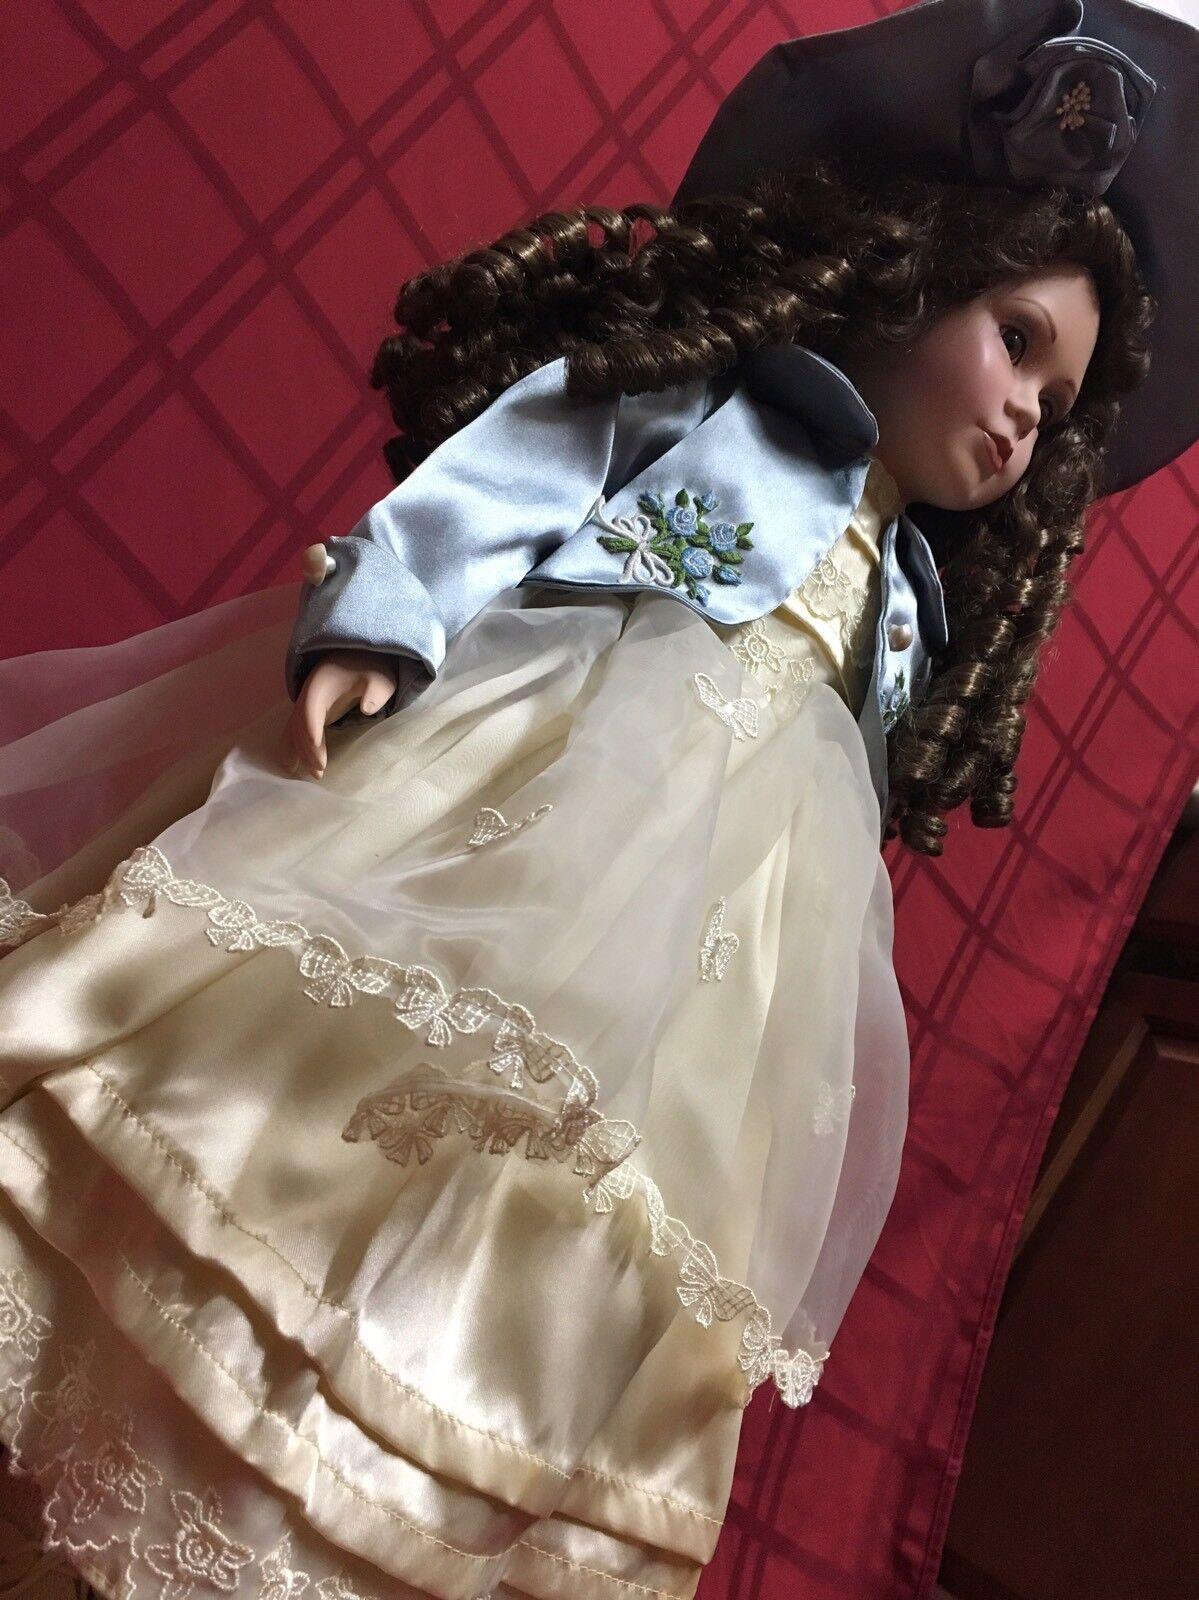 Court of Dolls 606/2500 23